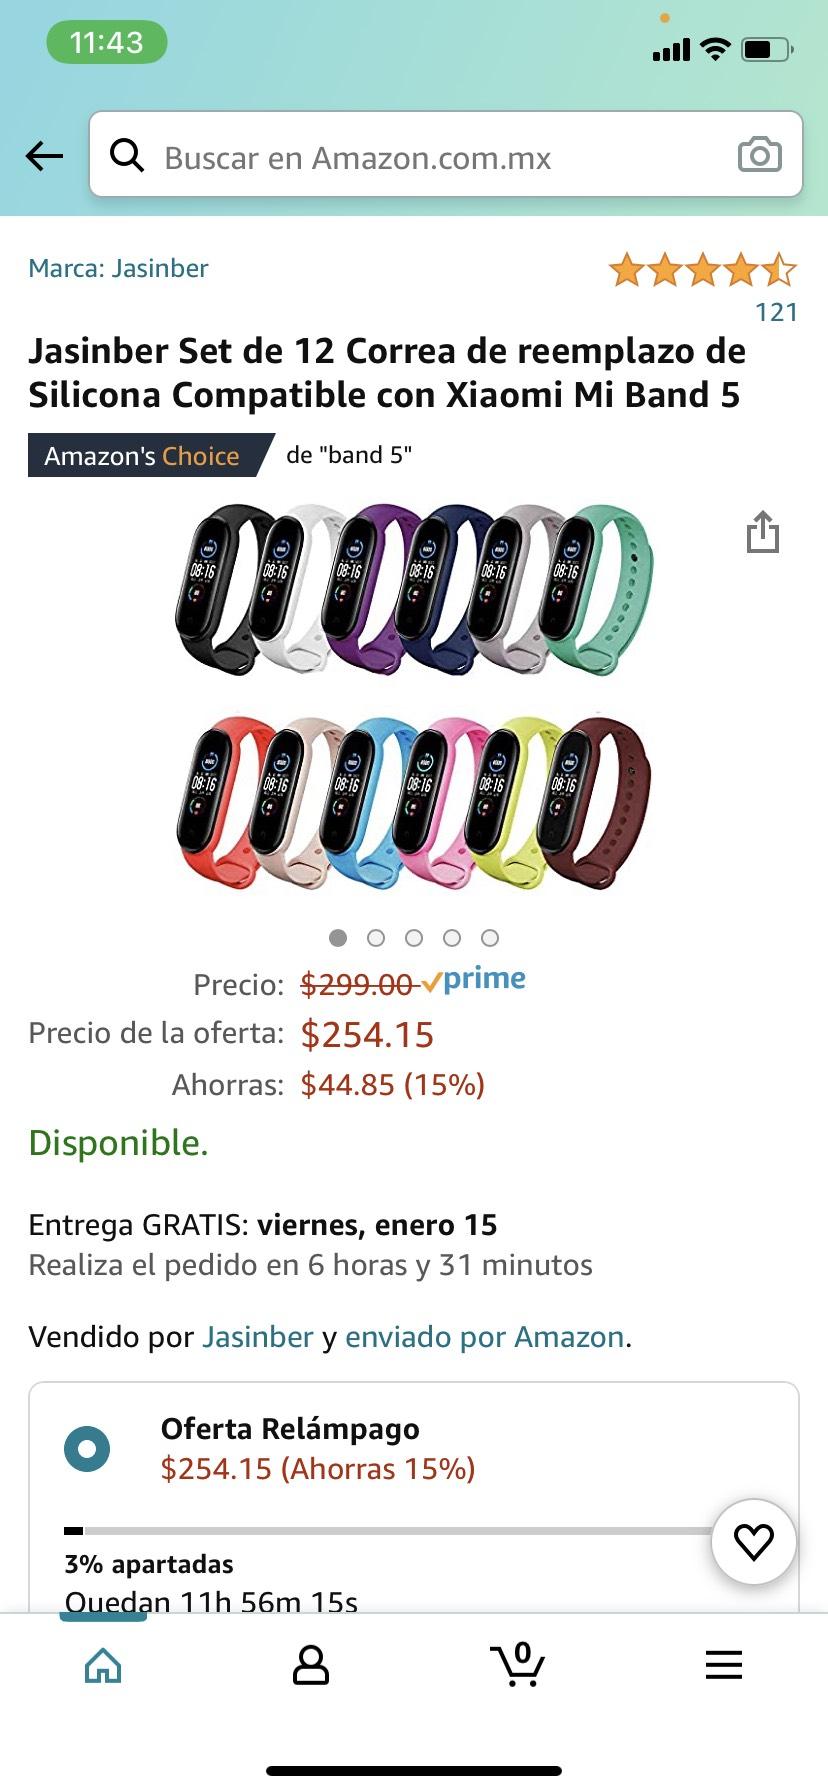 Amazon: Jasinber Set de 12 Correa de reemplazo de Silicona Compatible con Xiaomi Mi Band 5